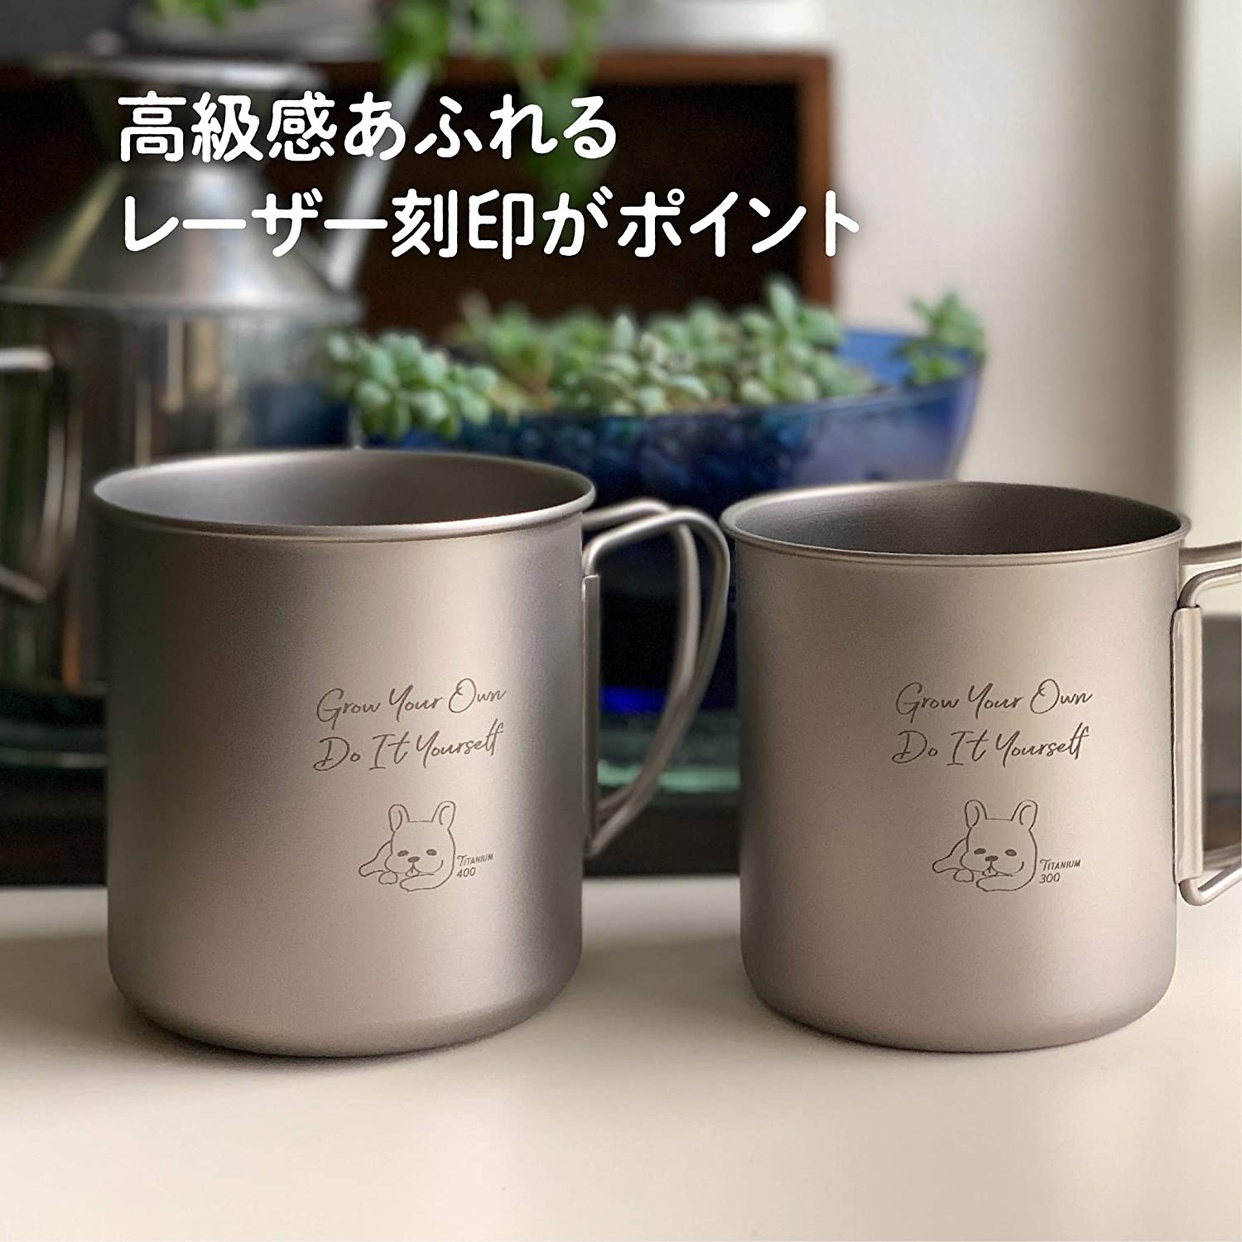 Meichan's Life(メイチャンズライフ) チタンマグの商品画像3